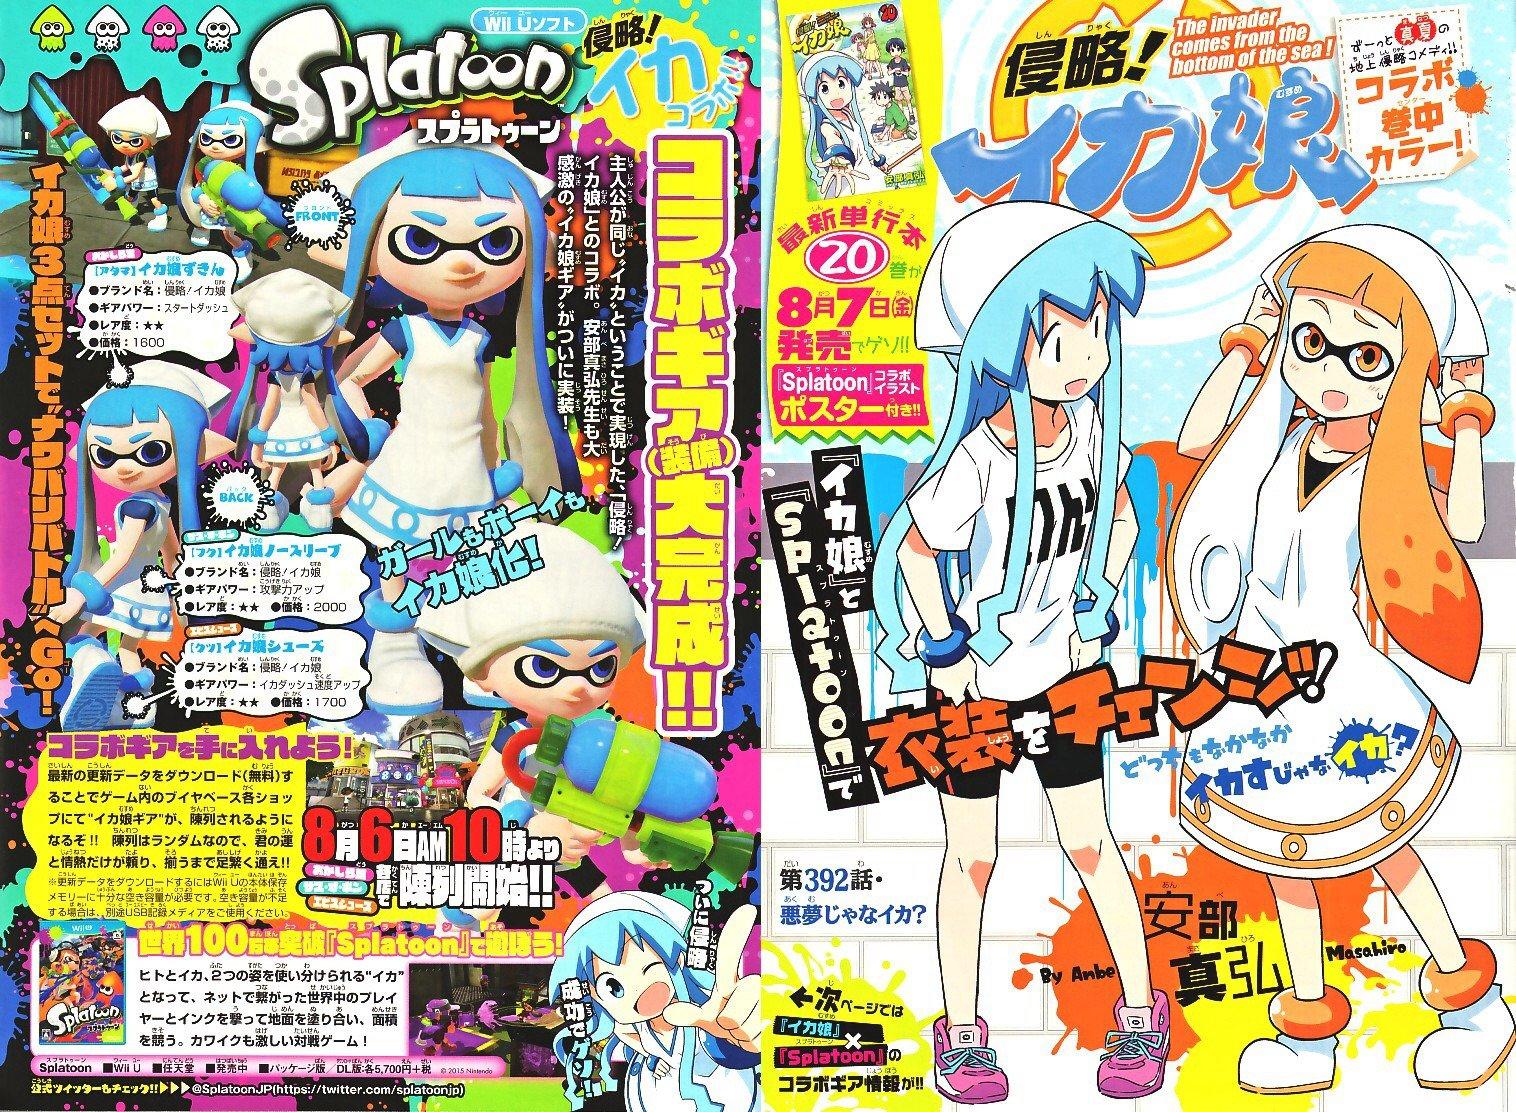 ika-musume-squid-girl-splatoon